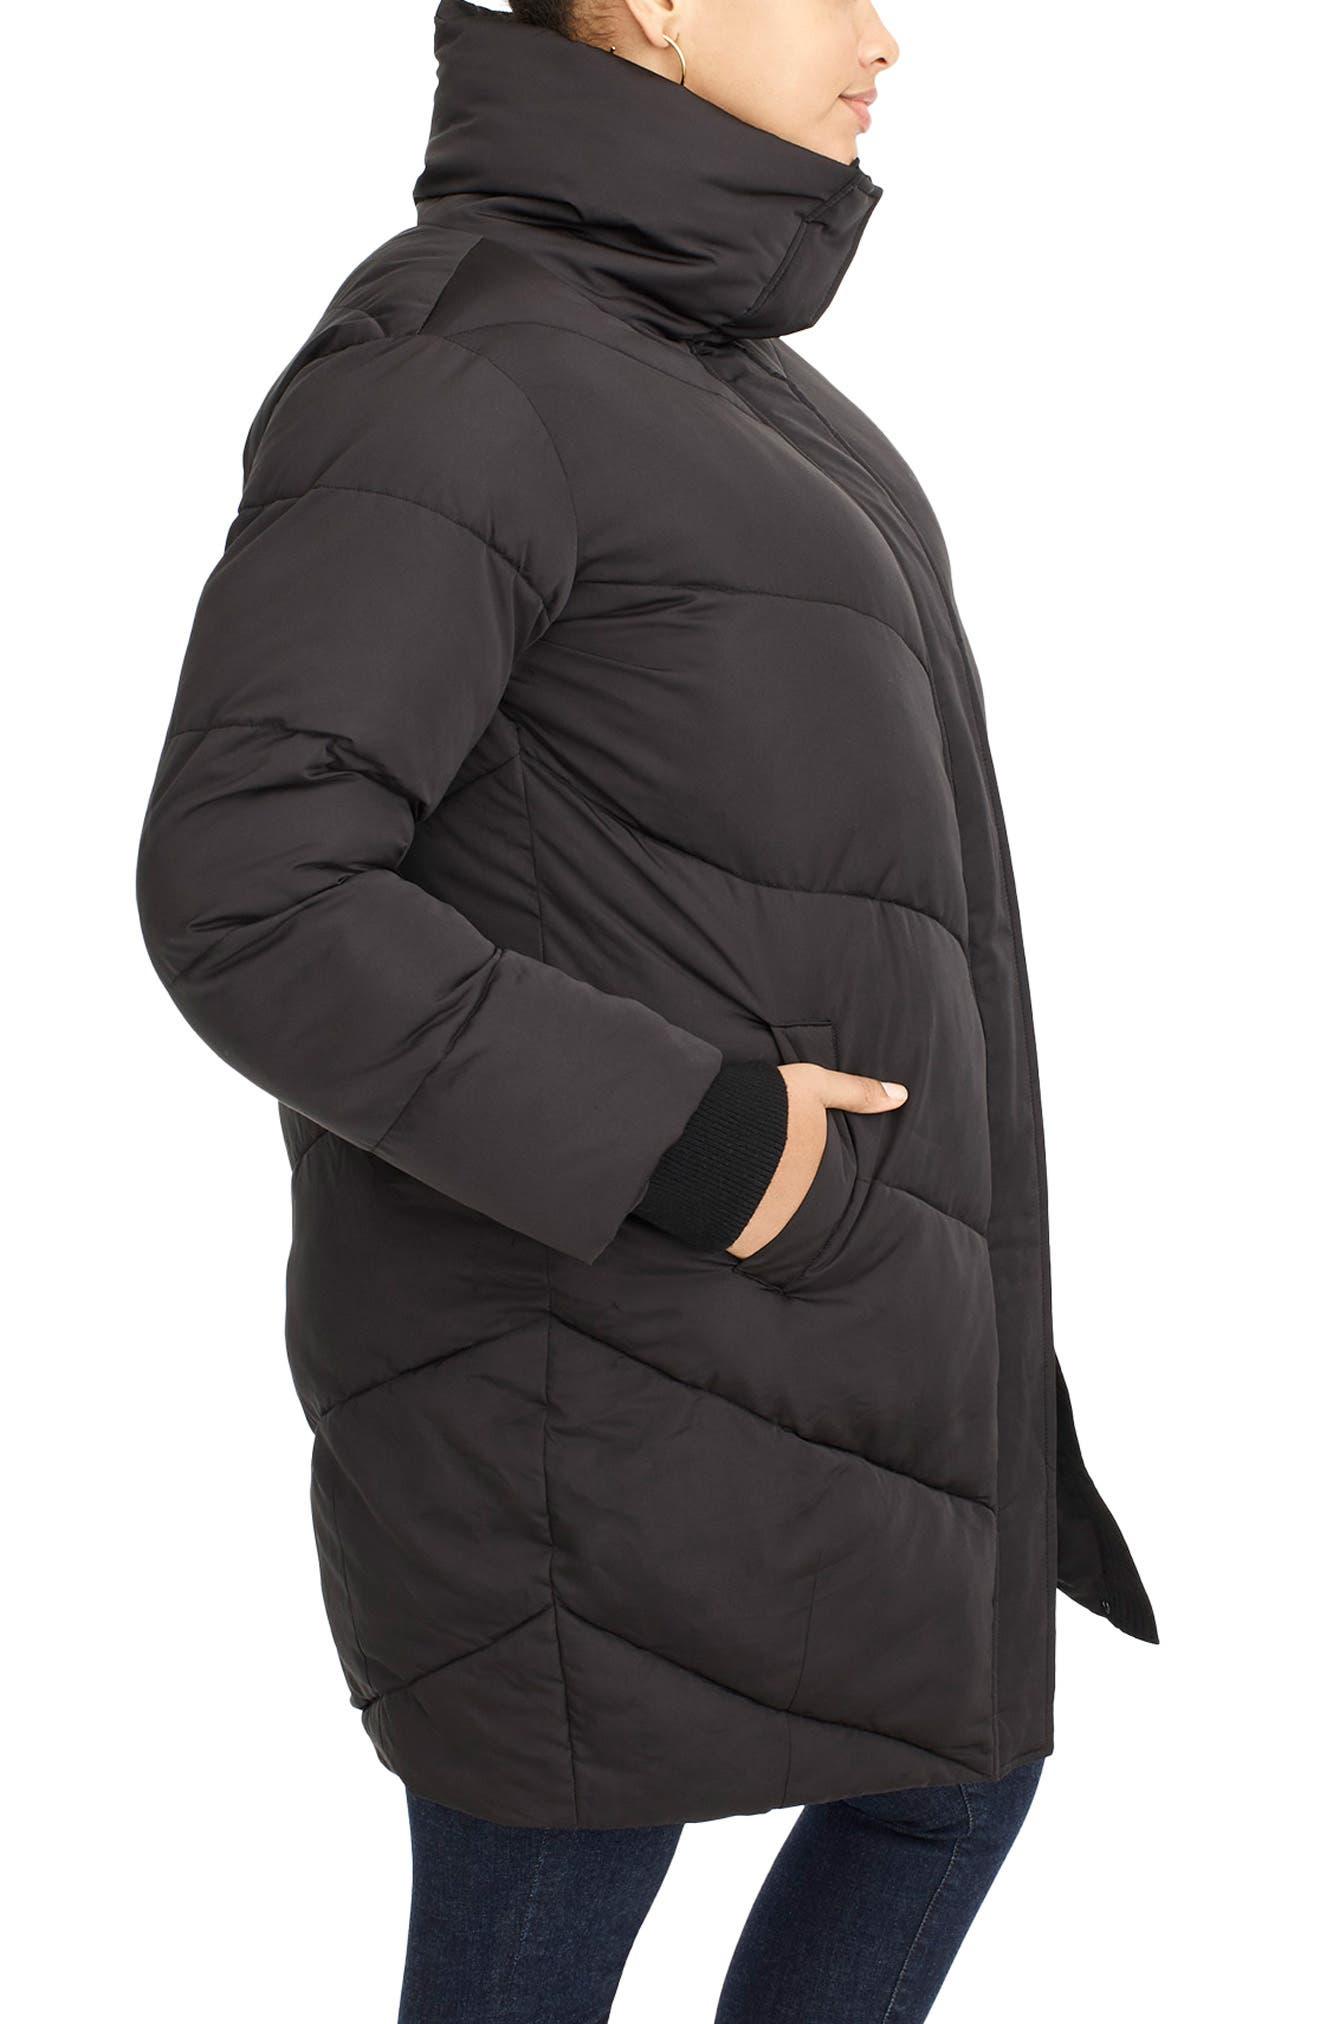 for J.Crew Chevron Long Puffer Coat,                             Alternate thumbnail 3, color,                             BLACK